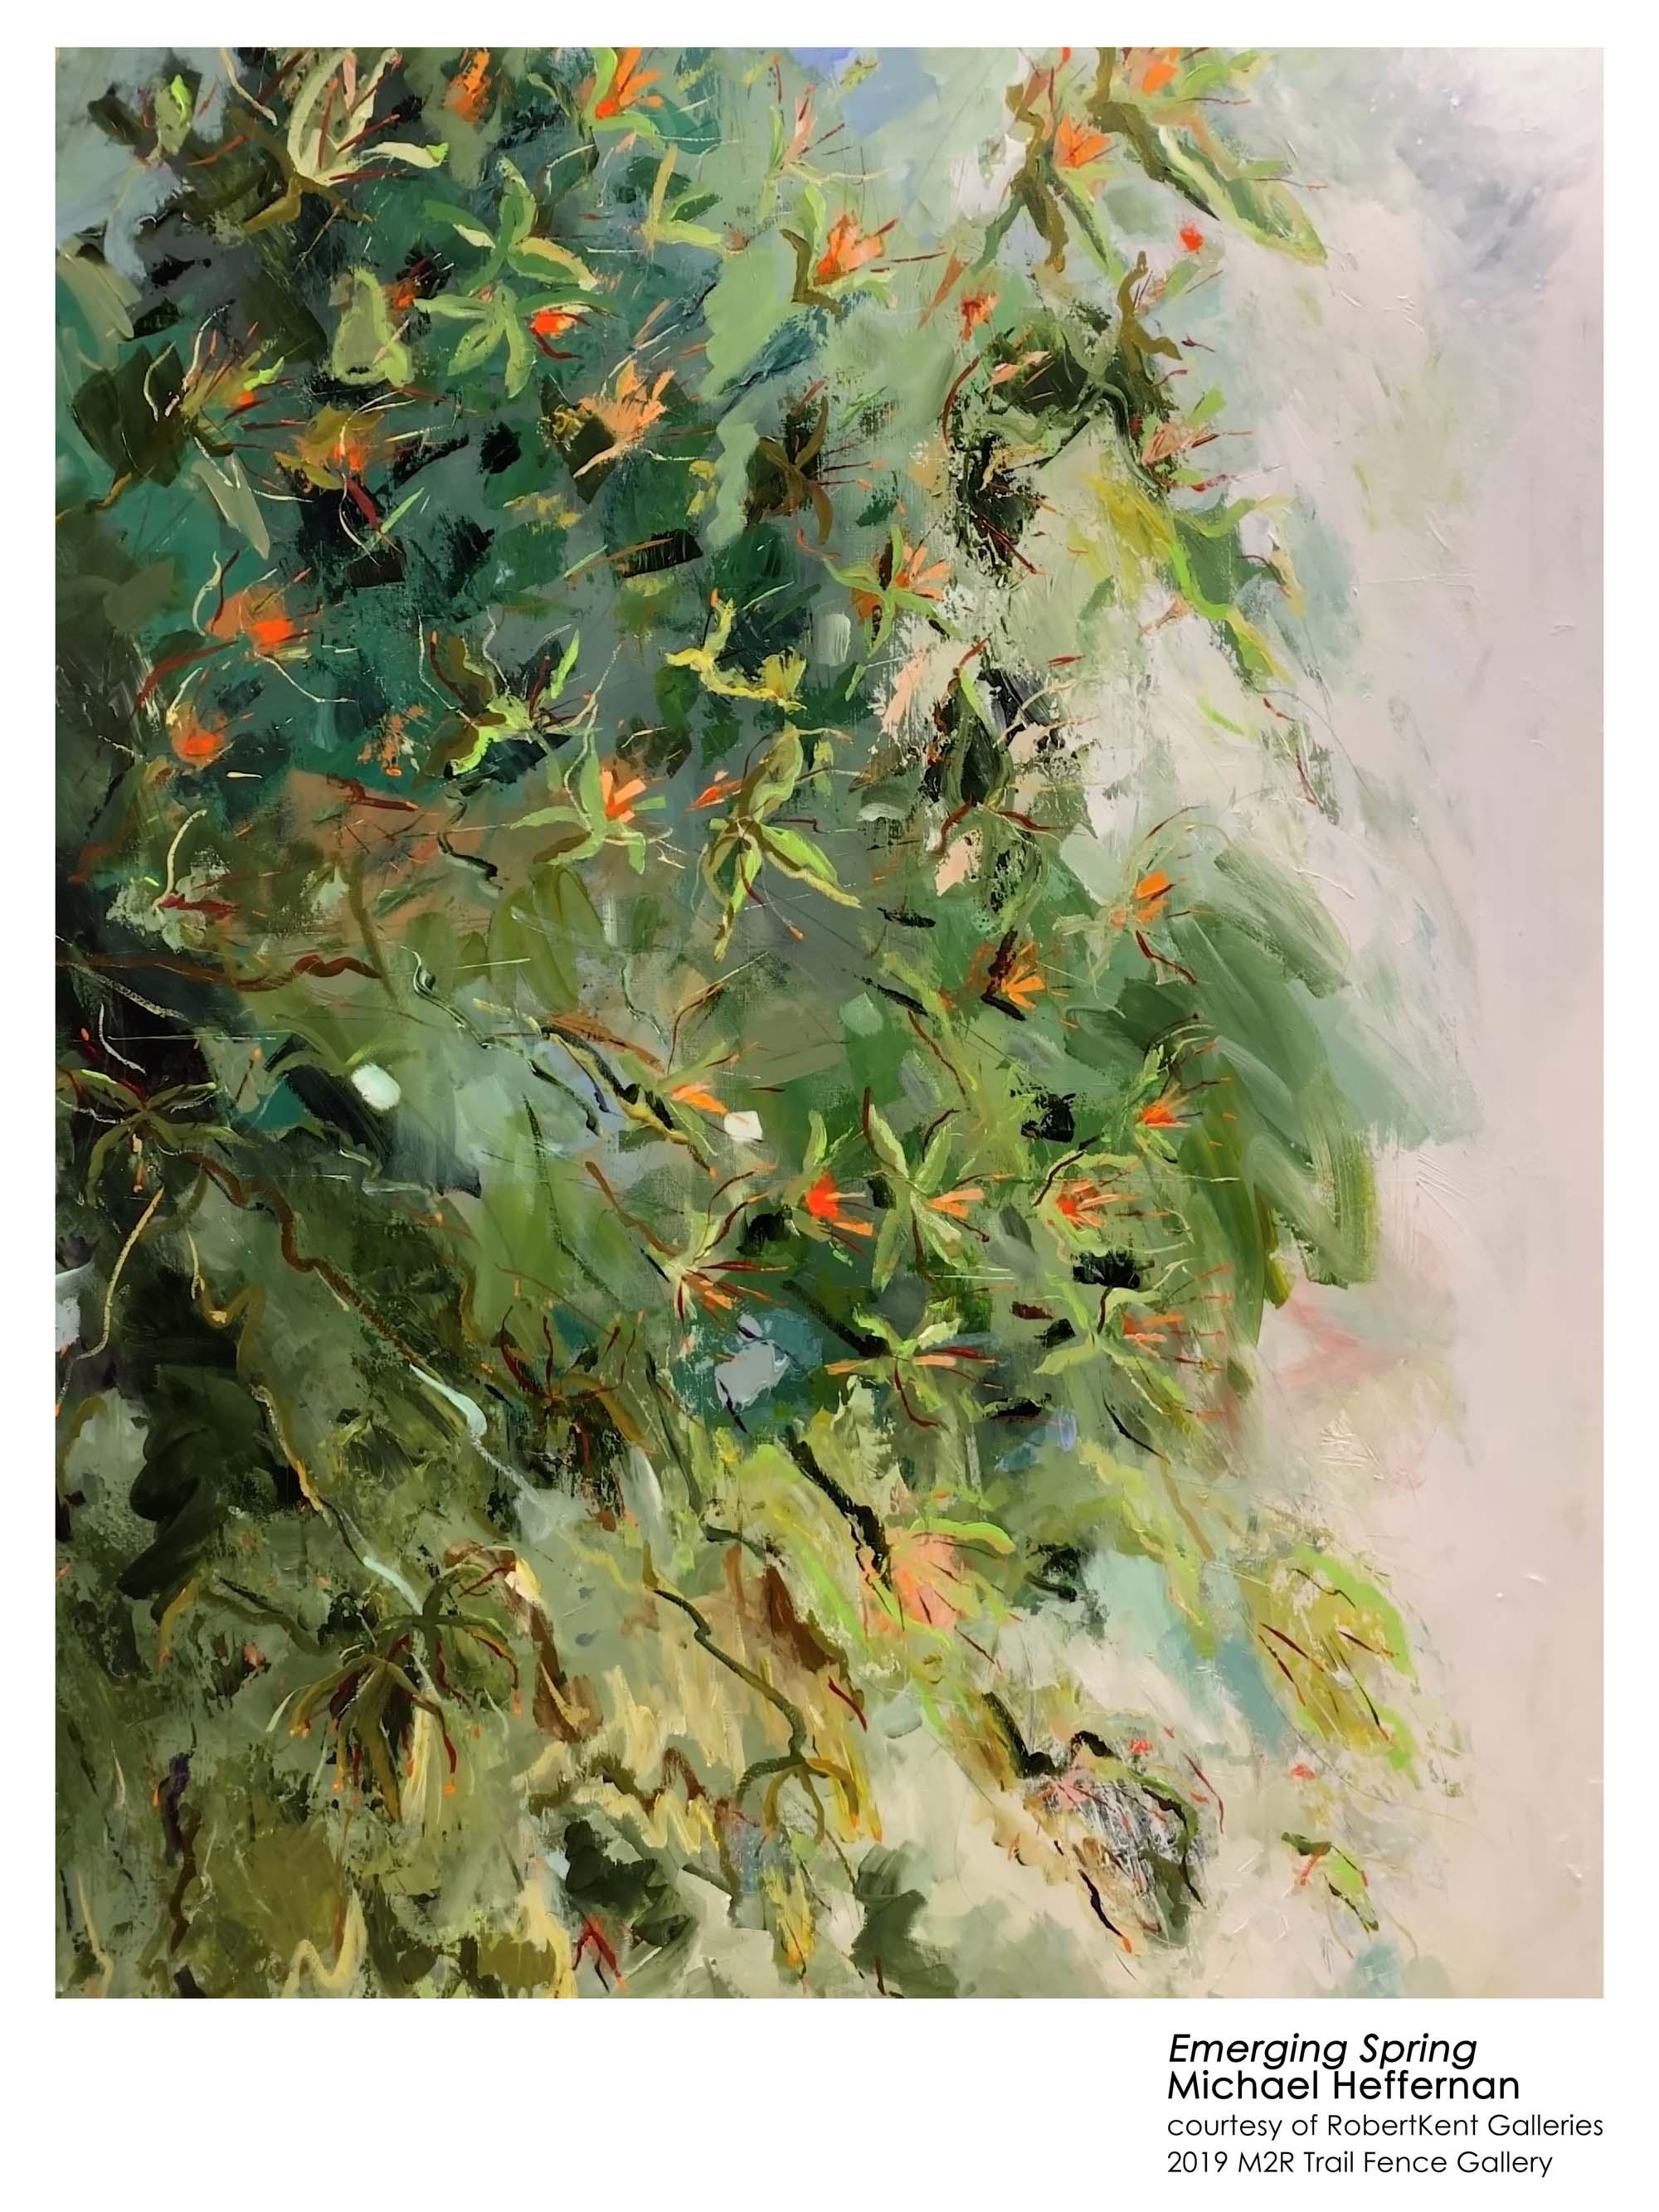 1902112ZA 60x48 Michael Heffernan _Emerging-Spring_ 20R0023 - lisa Spencer.jpg